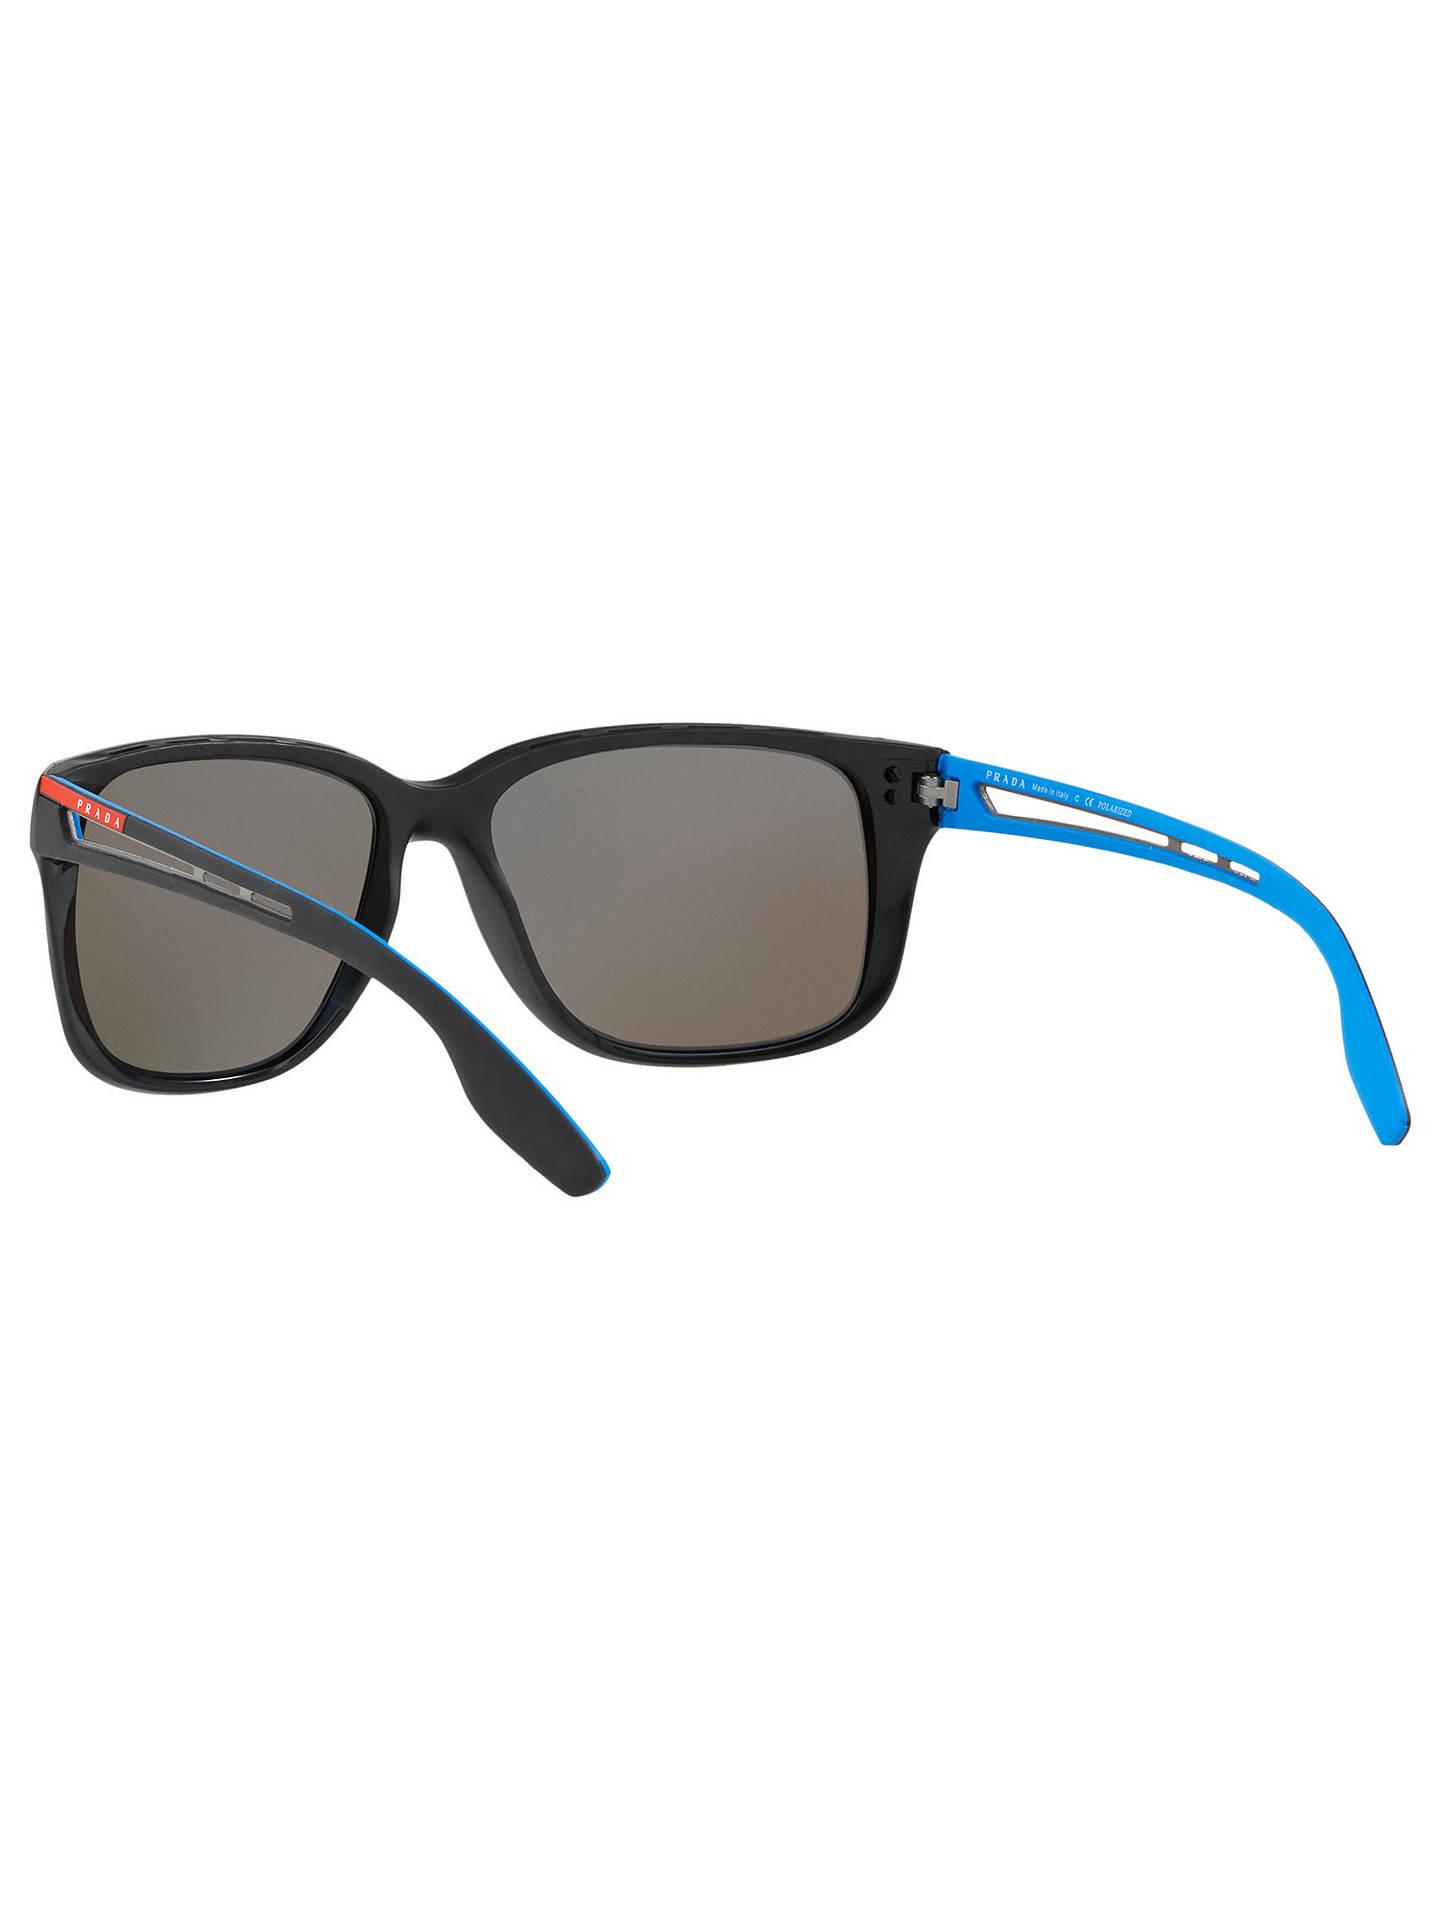 562f993e52 ... Buy Prada Linea Rossa PS 03TS Men s Polarised Rectangular Sunglasses